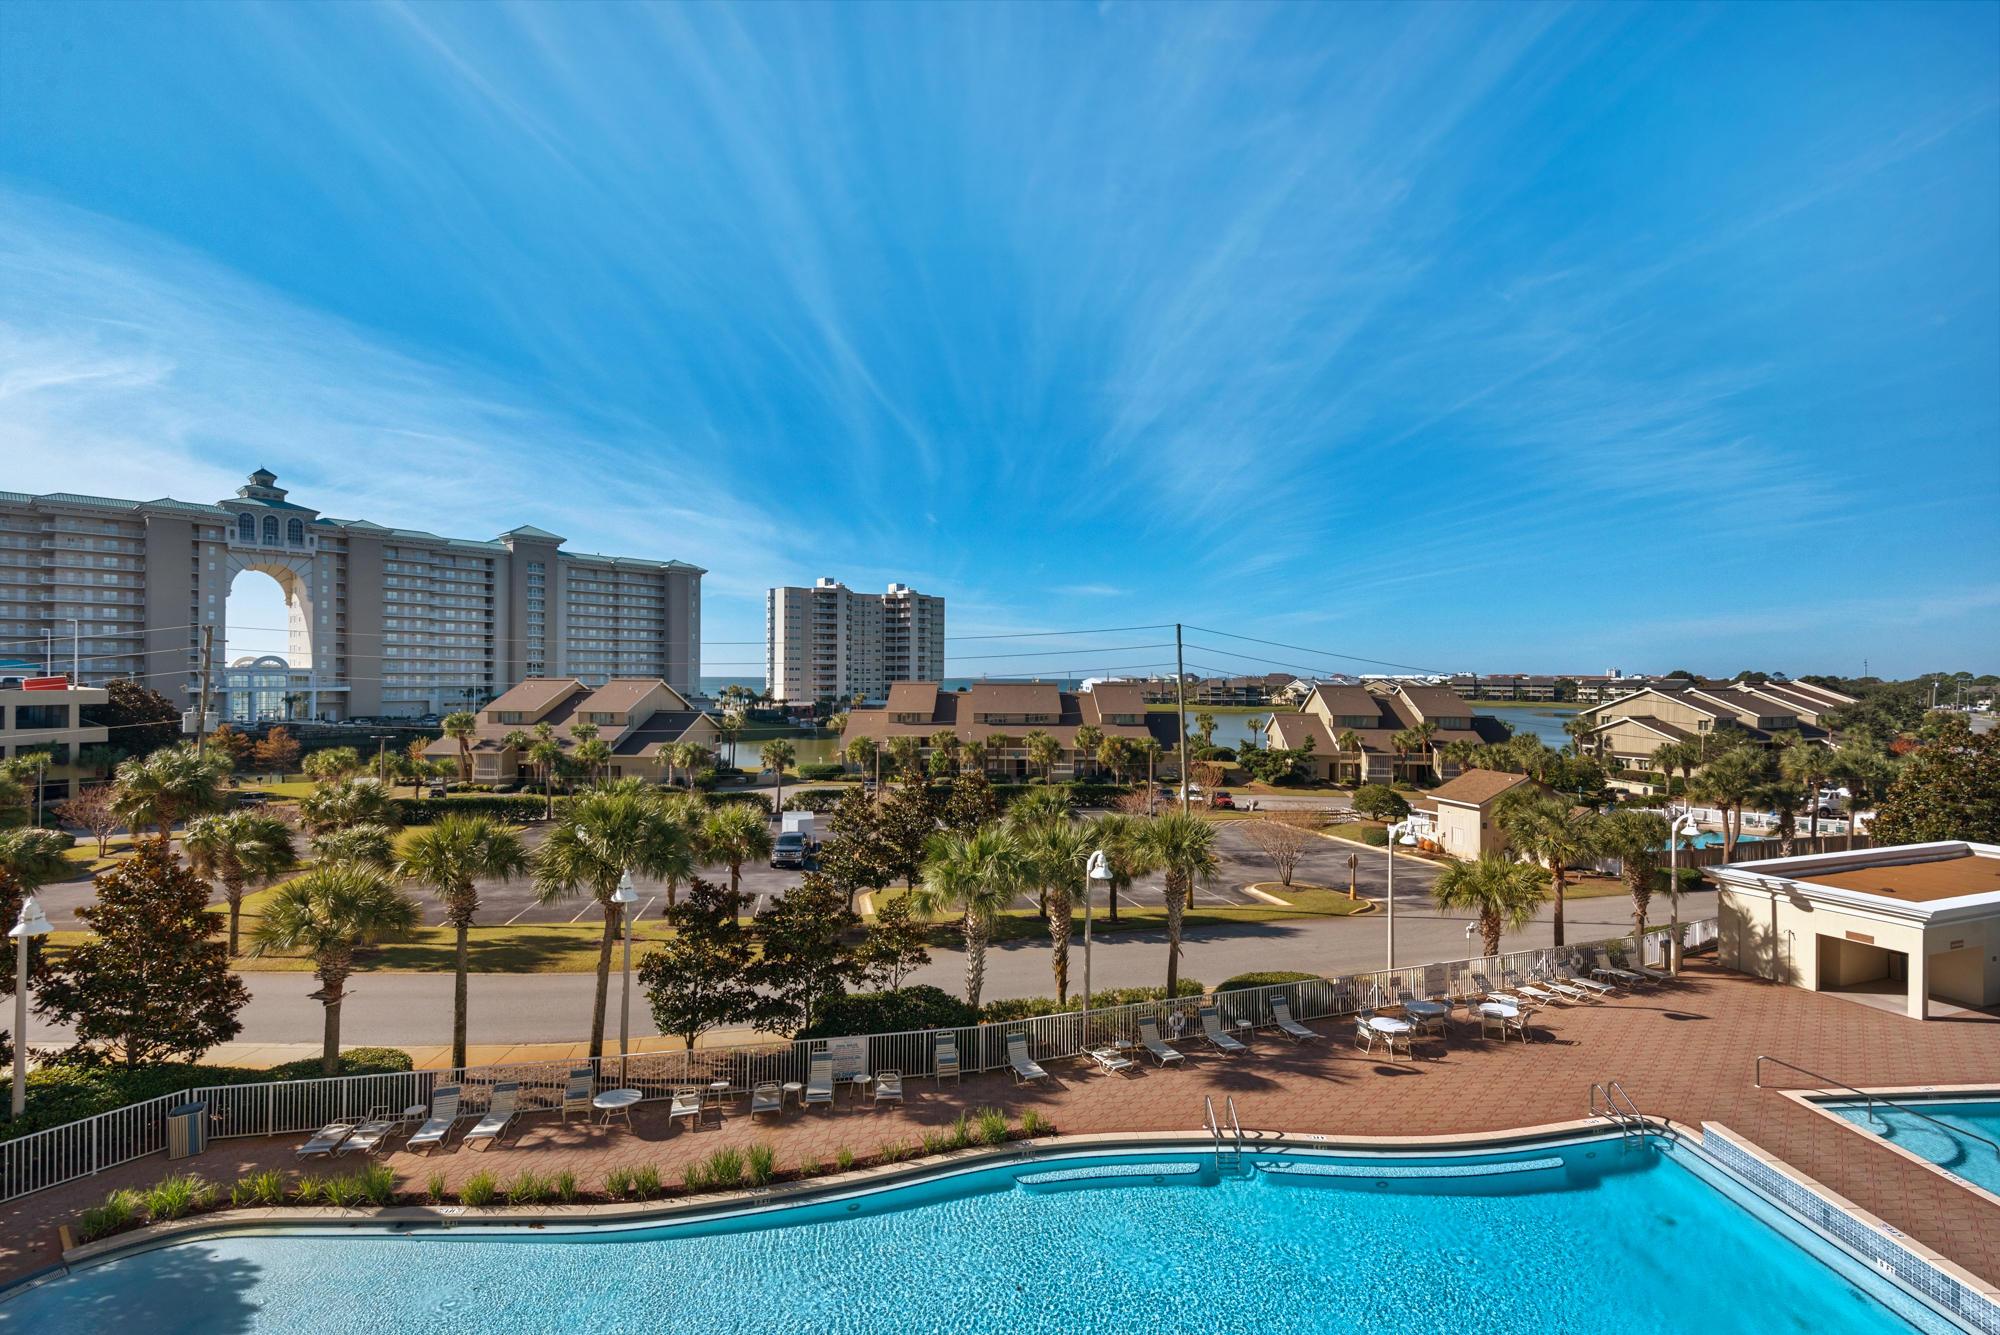 122 Seascape Drive,Miramar Beach,Florida 32550,2 Bedrooms Bedrooms,2 BathroomsBathrooms,Condominium,Seascape Drive,20131126143817002353000000